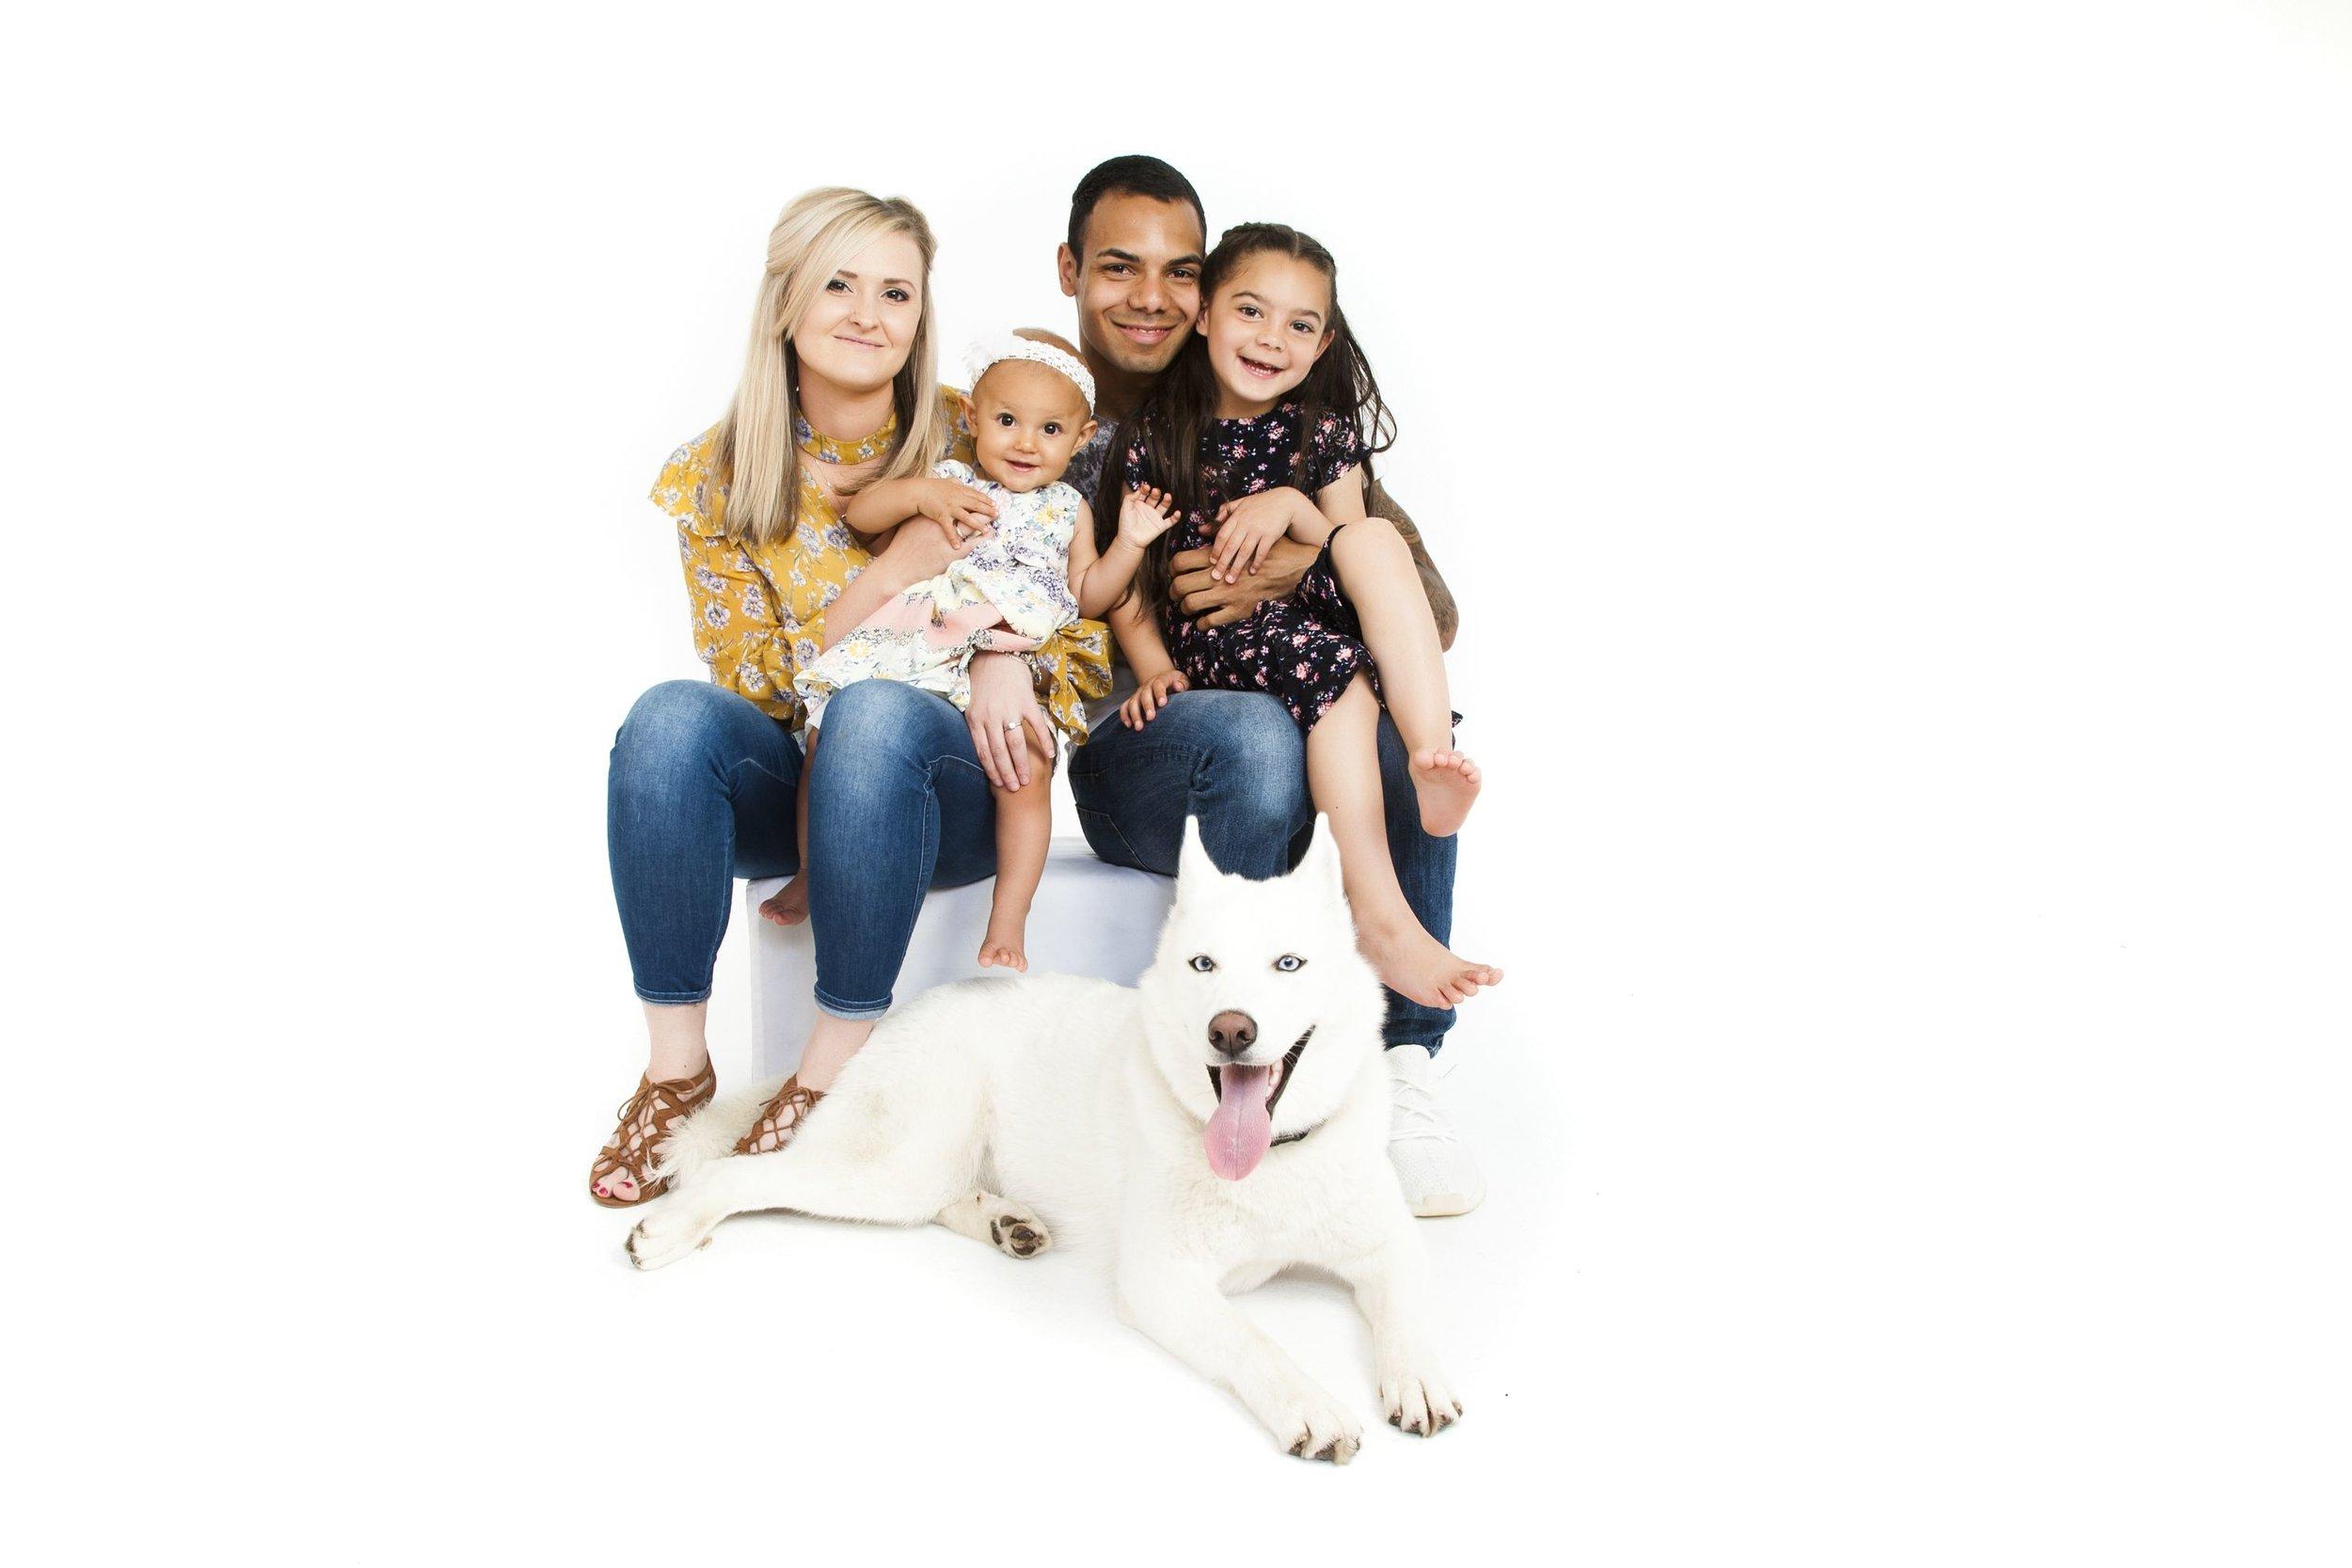 family-portrait-leicester-photo-shoot-photographers-pet-kids-photography-studio-le2-zigzag-zig-zag.JPG